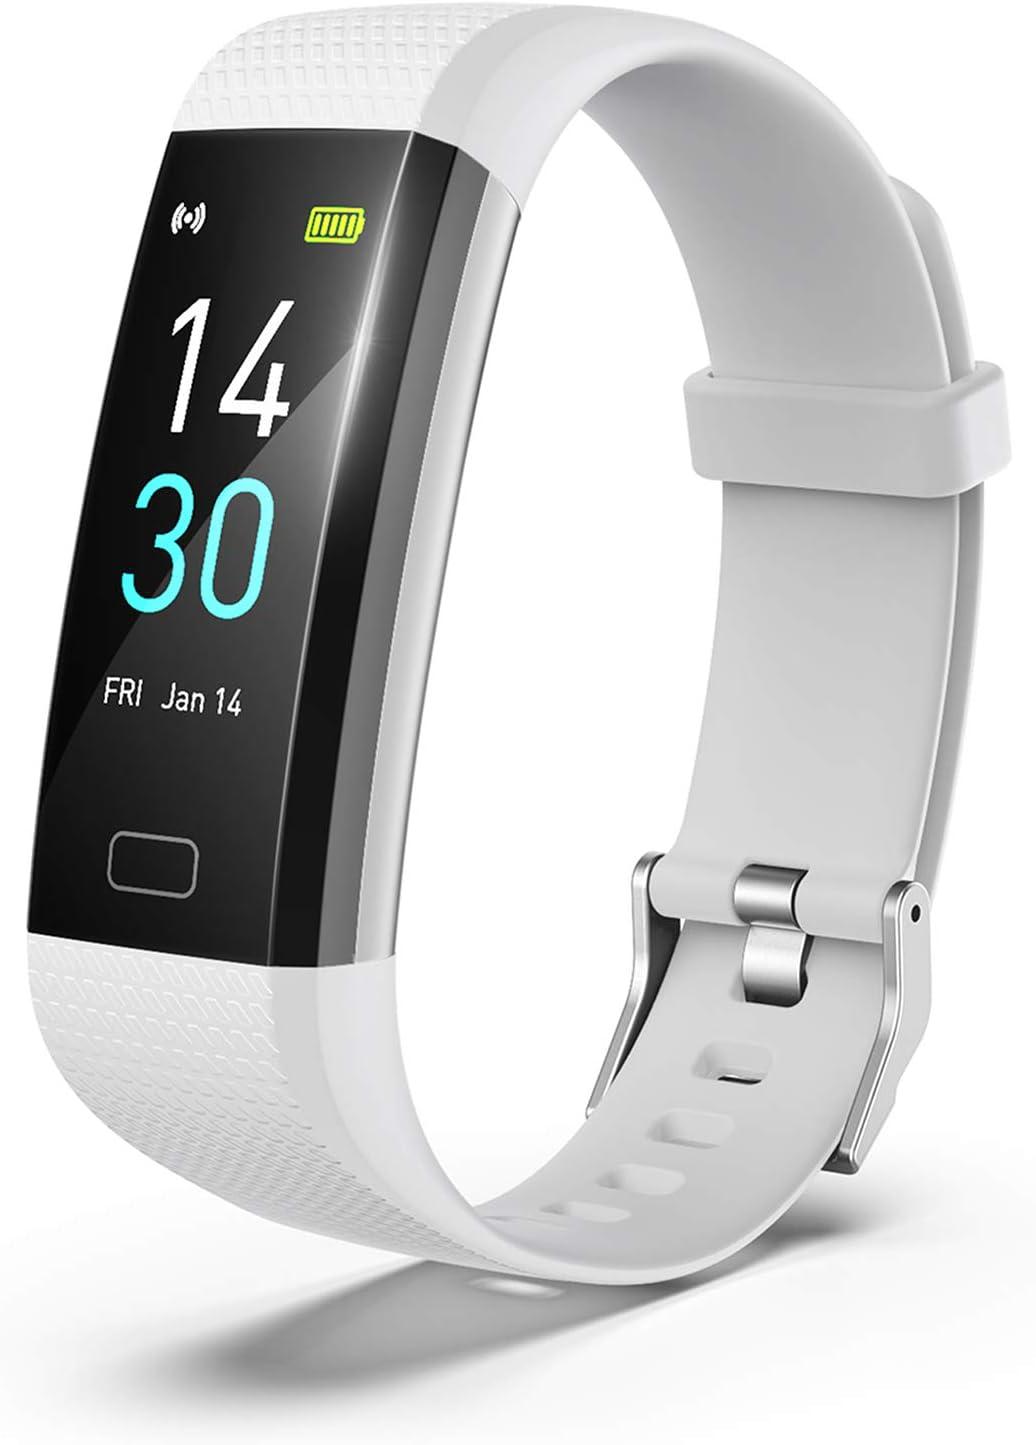 Fitness Tracker Great interest IP68 Waterproof Smart Sport Watch Band Wrist Challenge the lowest price of Japan ☆ 16